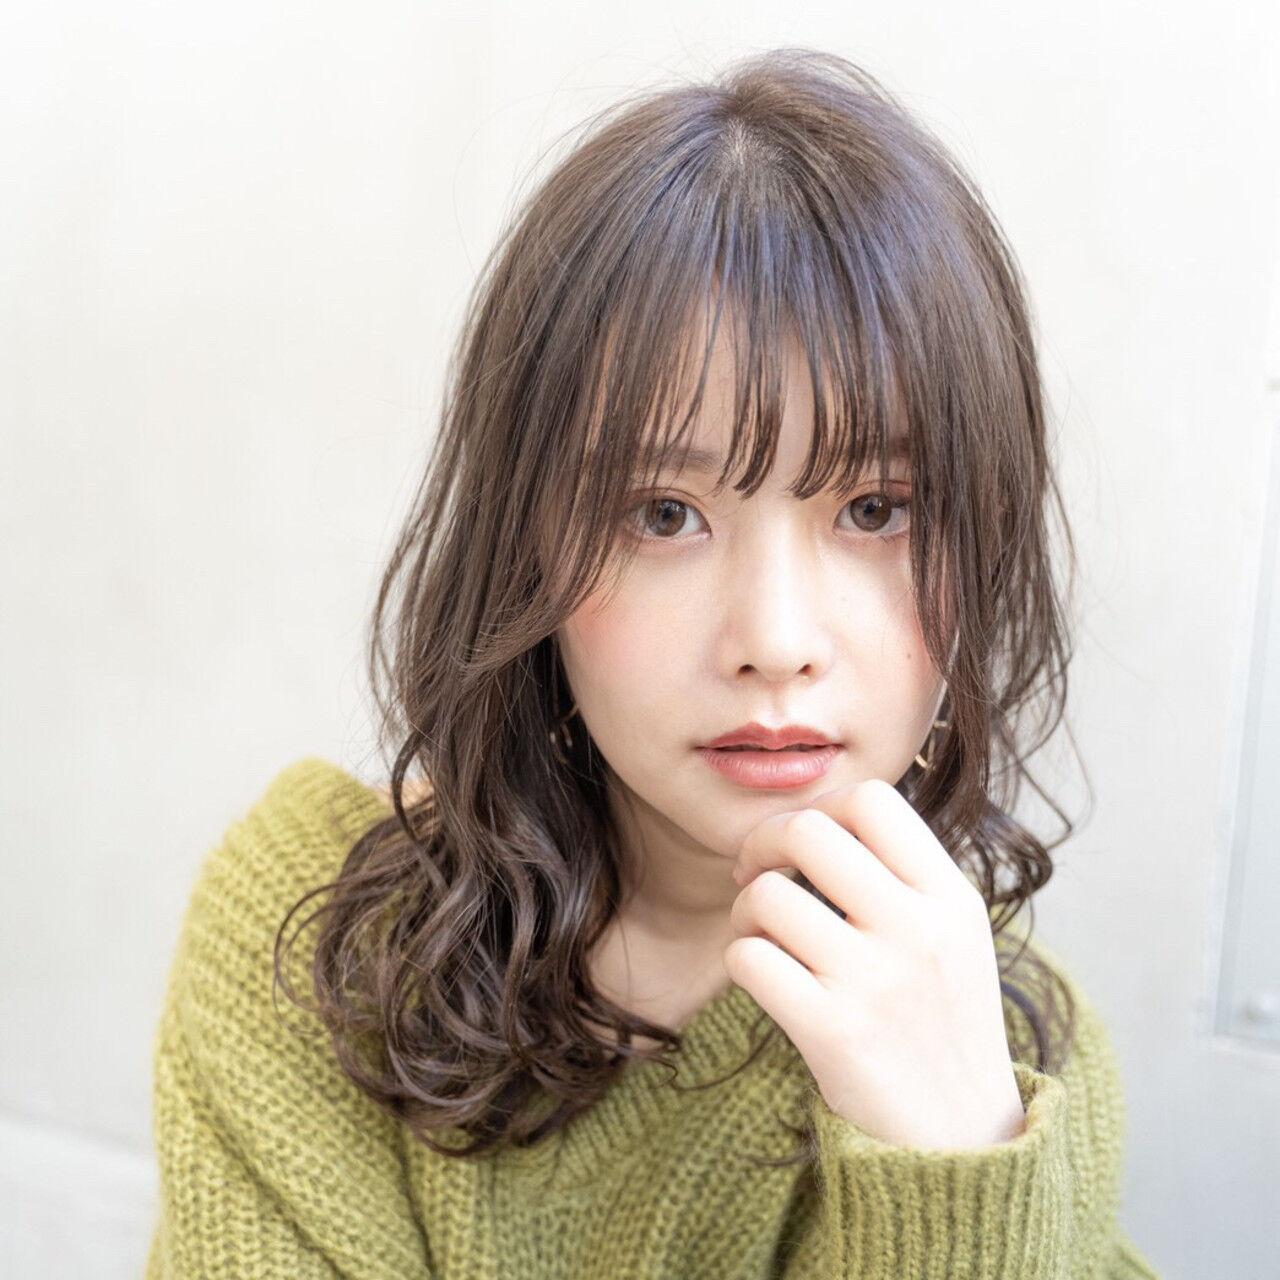 明田美緒/alansmithee